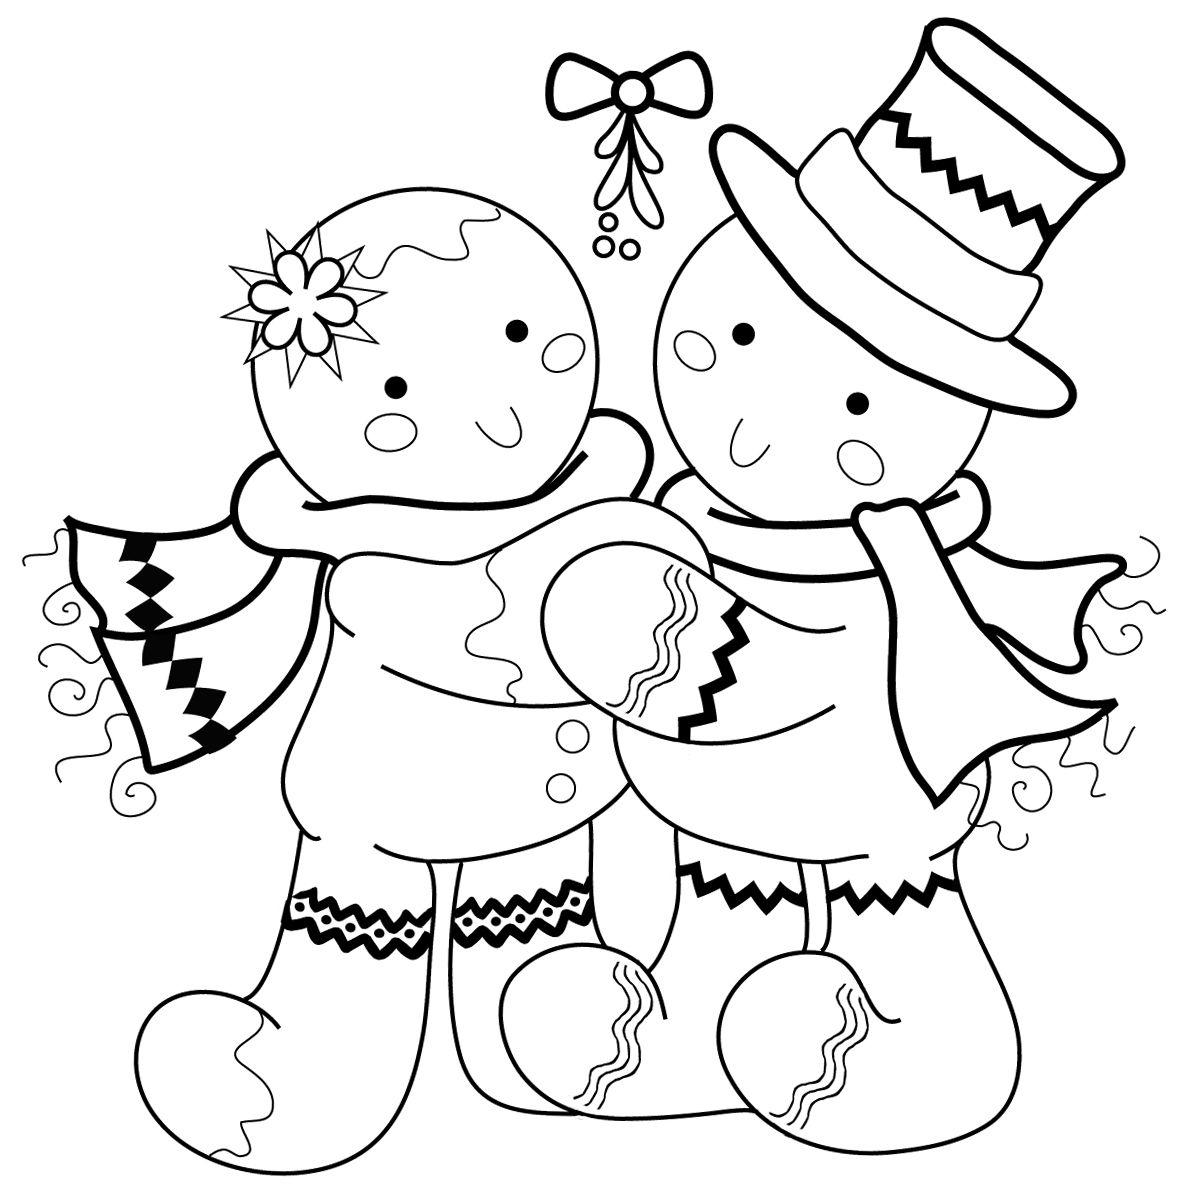 Marisa Straccia: Gingerbread Men | gingerbread men coloring pages ...